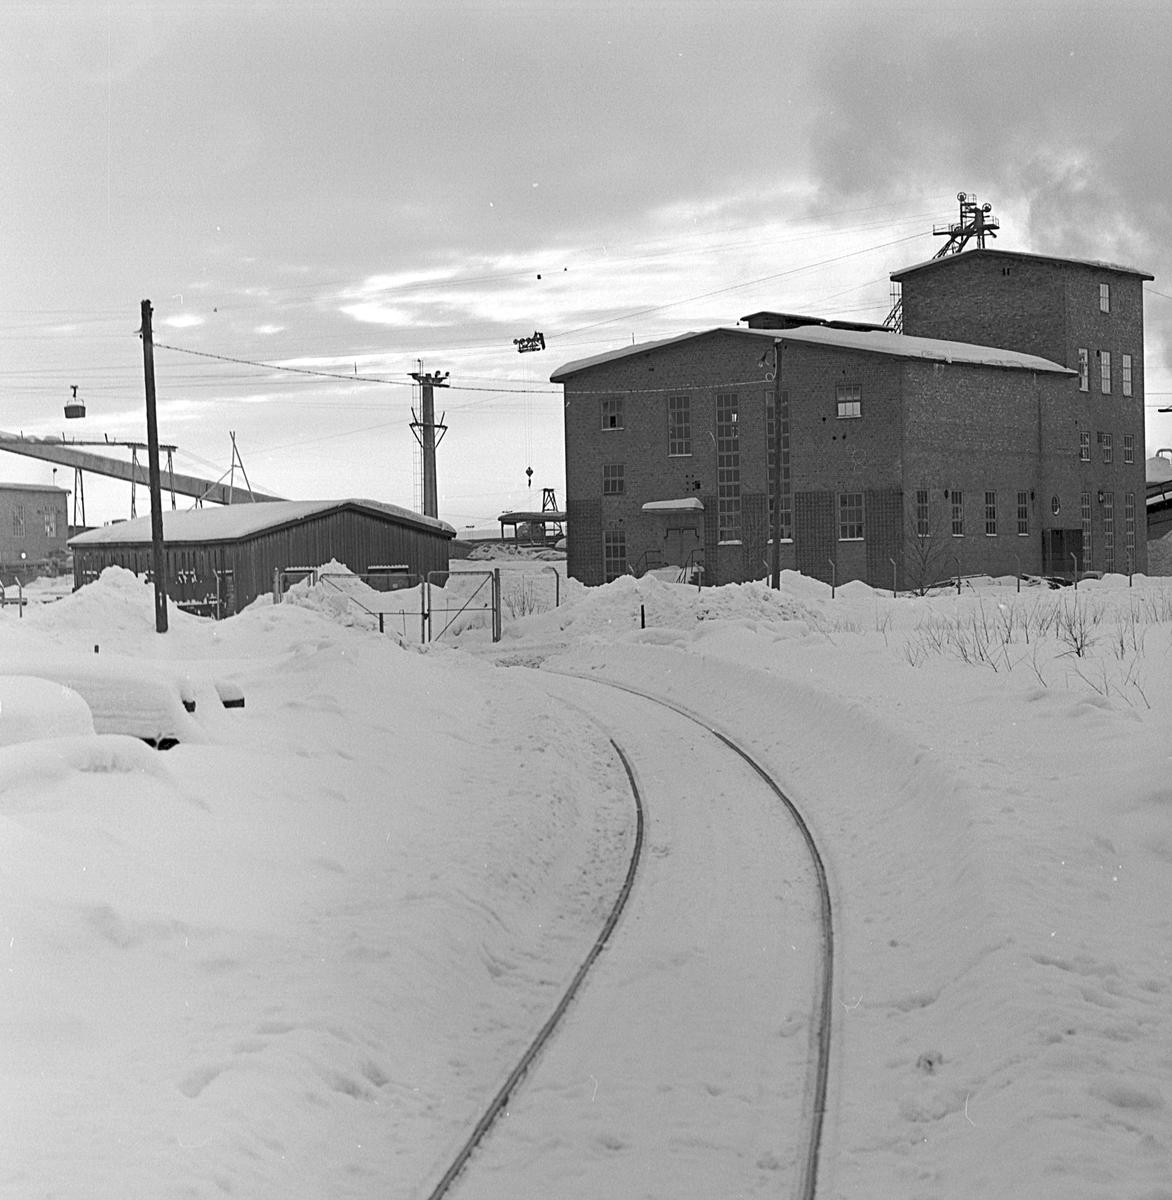 AB Statens Skogsindustrier, ASSI, Piteå